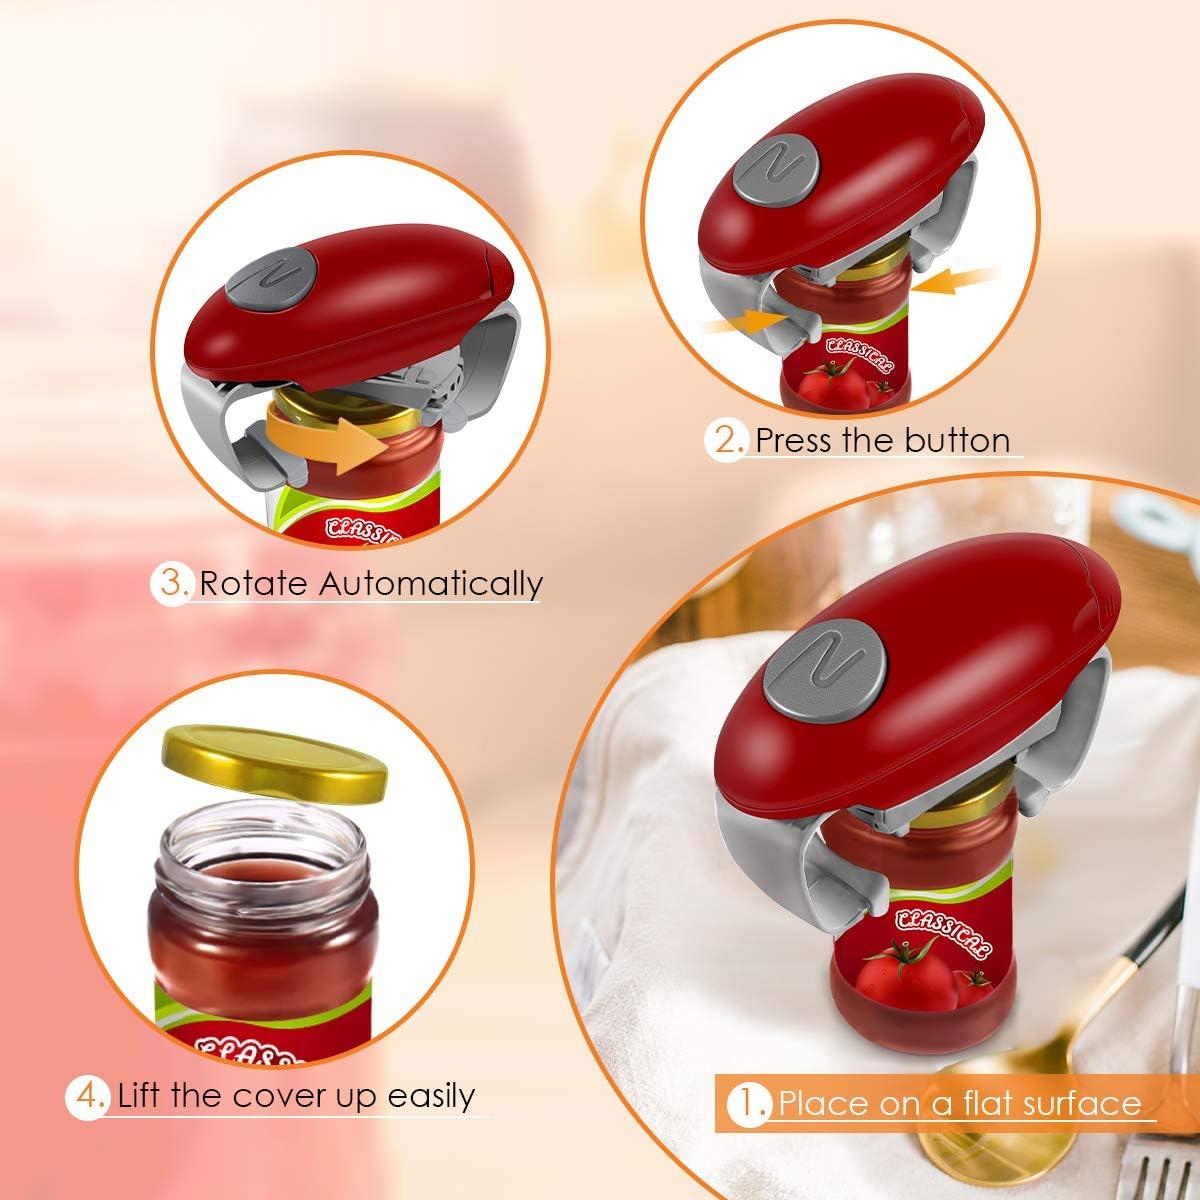 Wine Red Hands Free Bottle Opener Restaurant Automatic Jar Opener for Seniors with Arthritis Electric Jar Opener